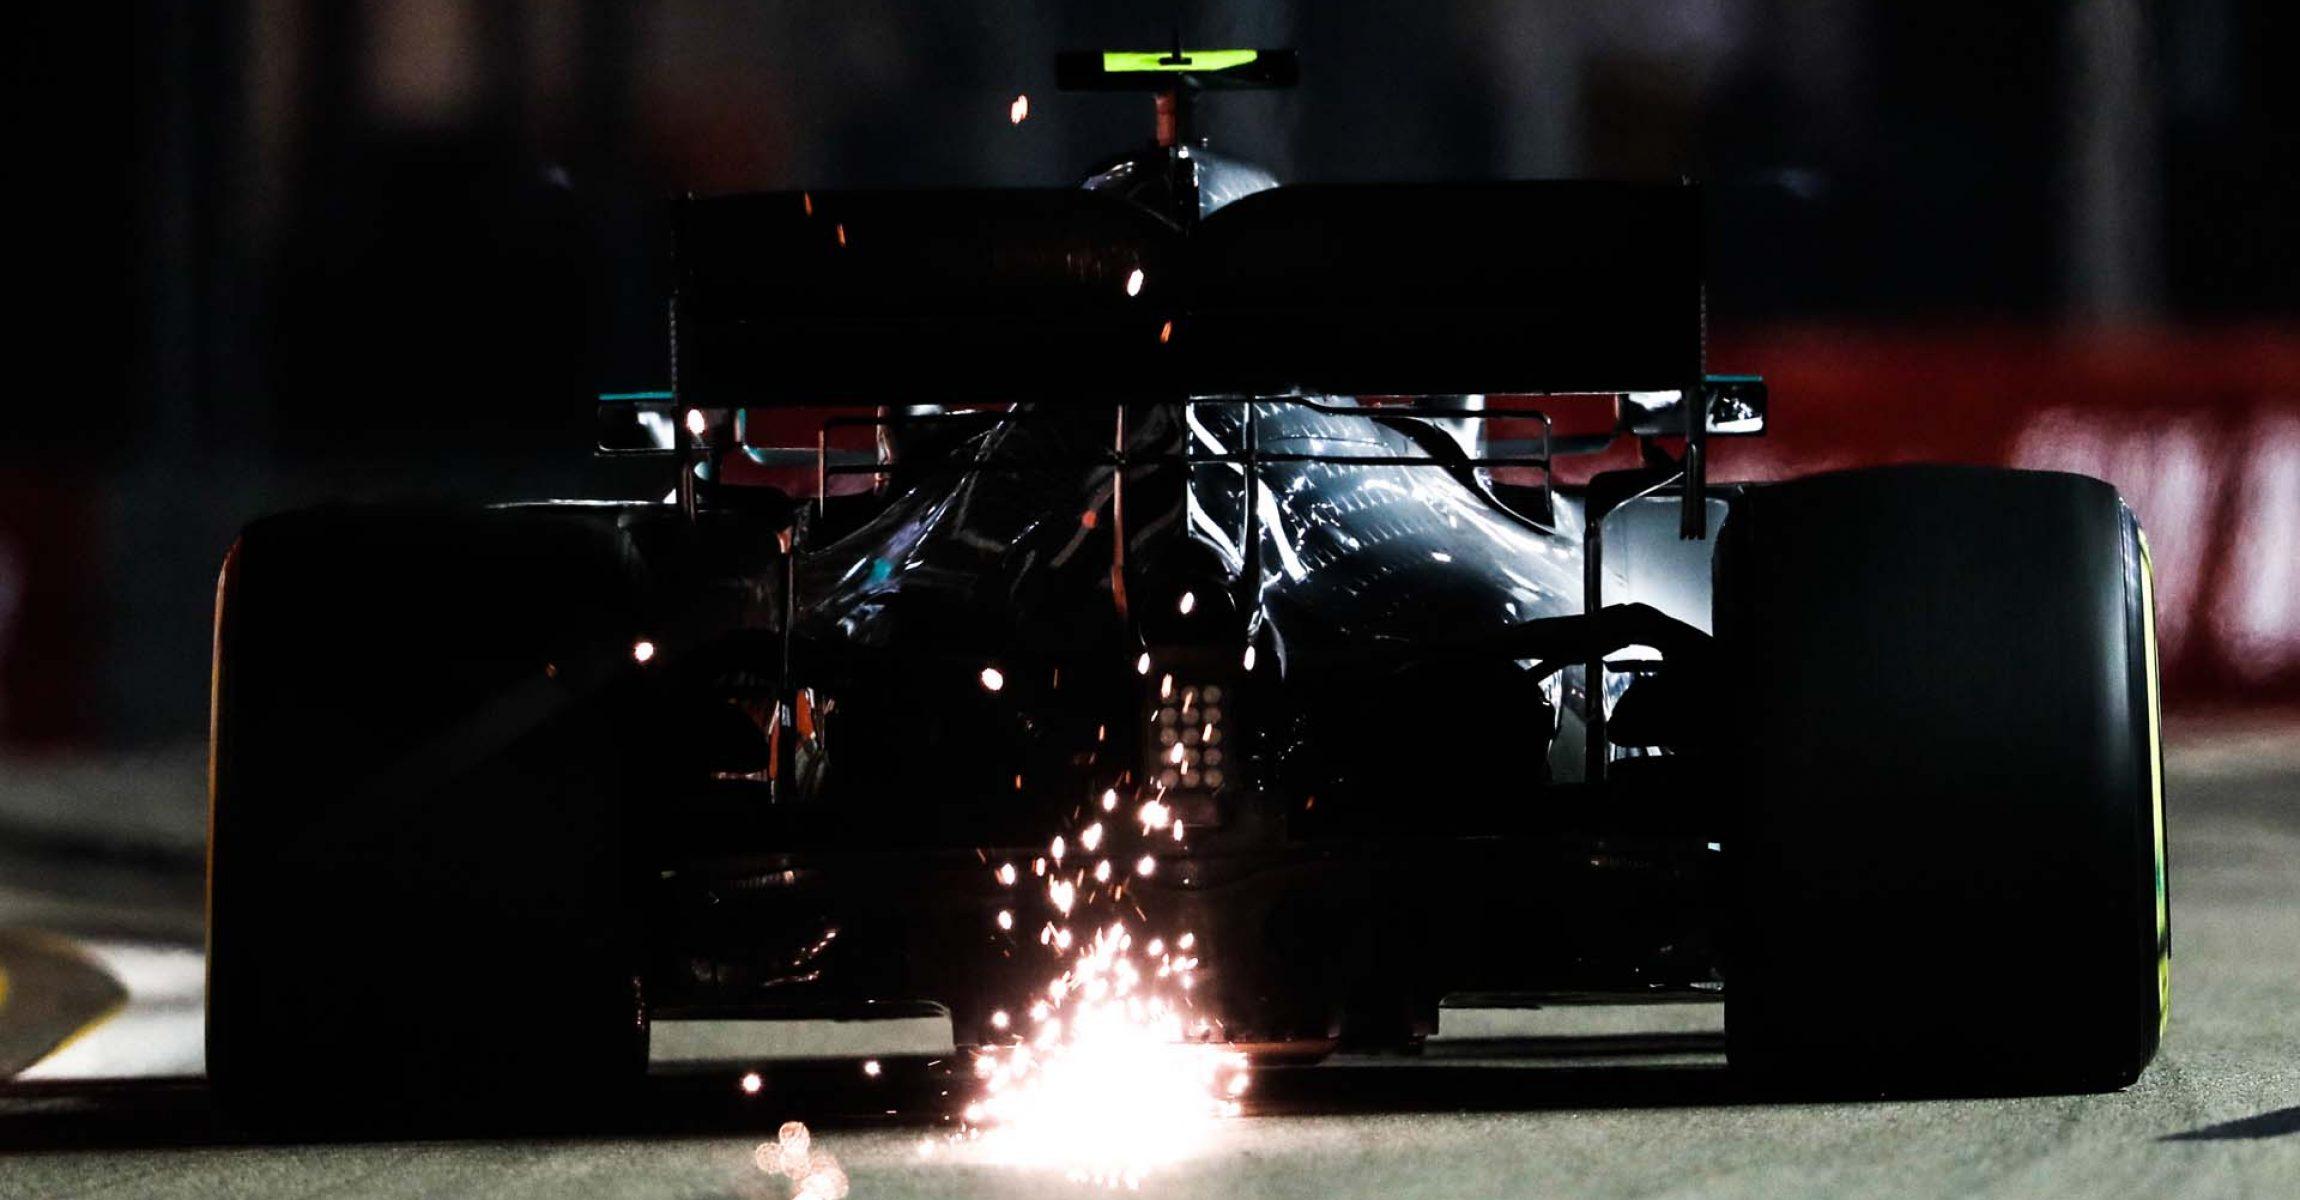 2019 Singapore Grand Prix, Friday - LAT Images Valtteri Bottas Mercedes spark